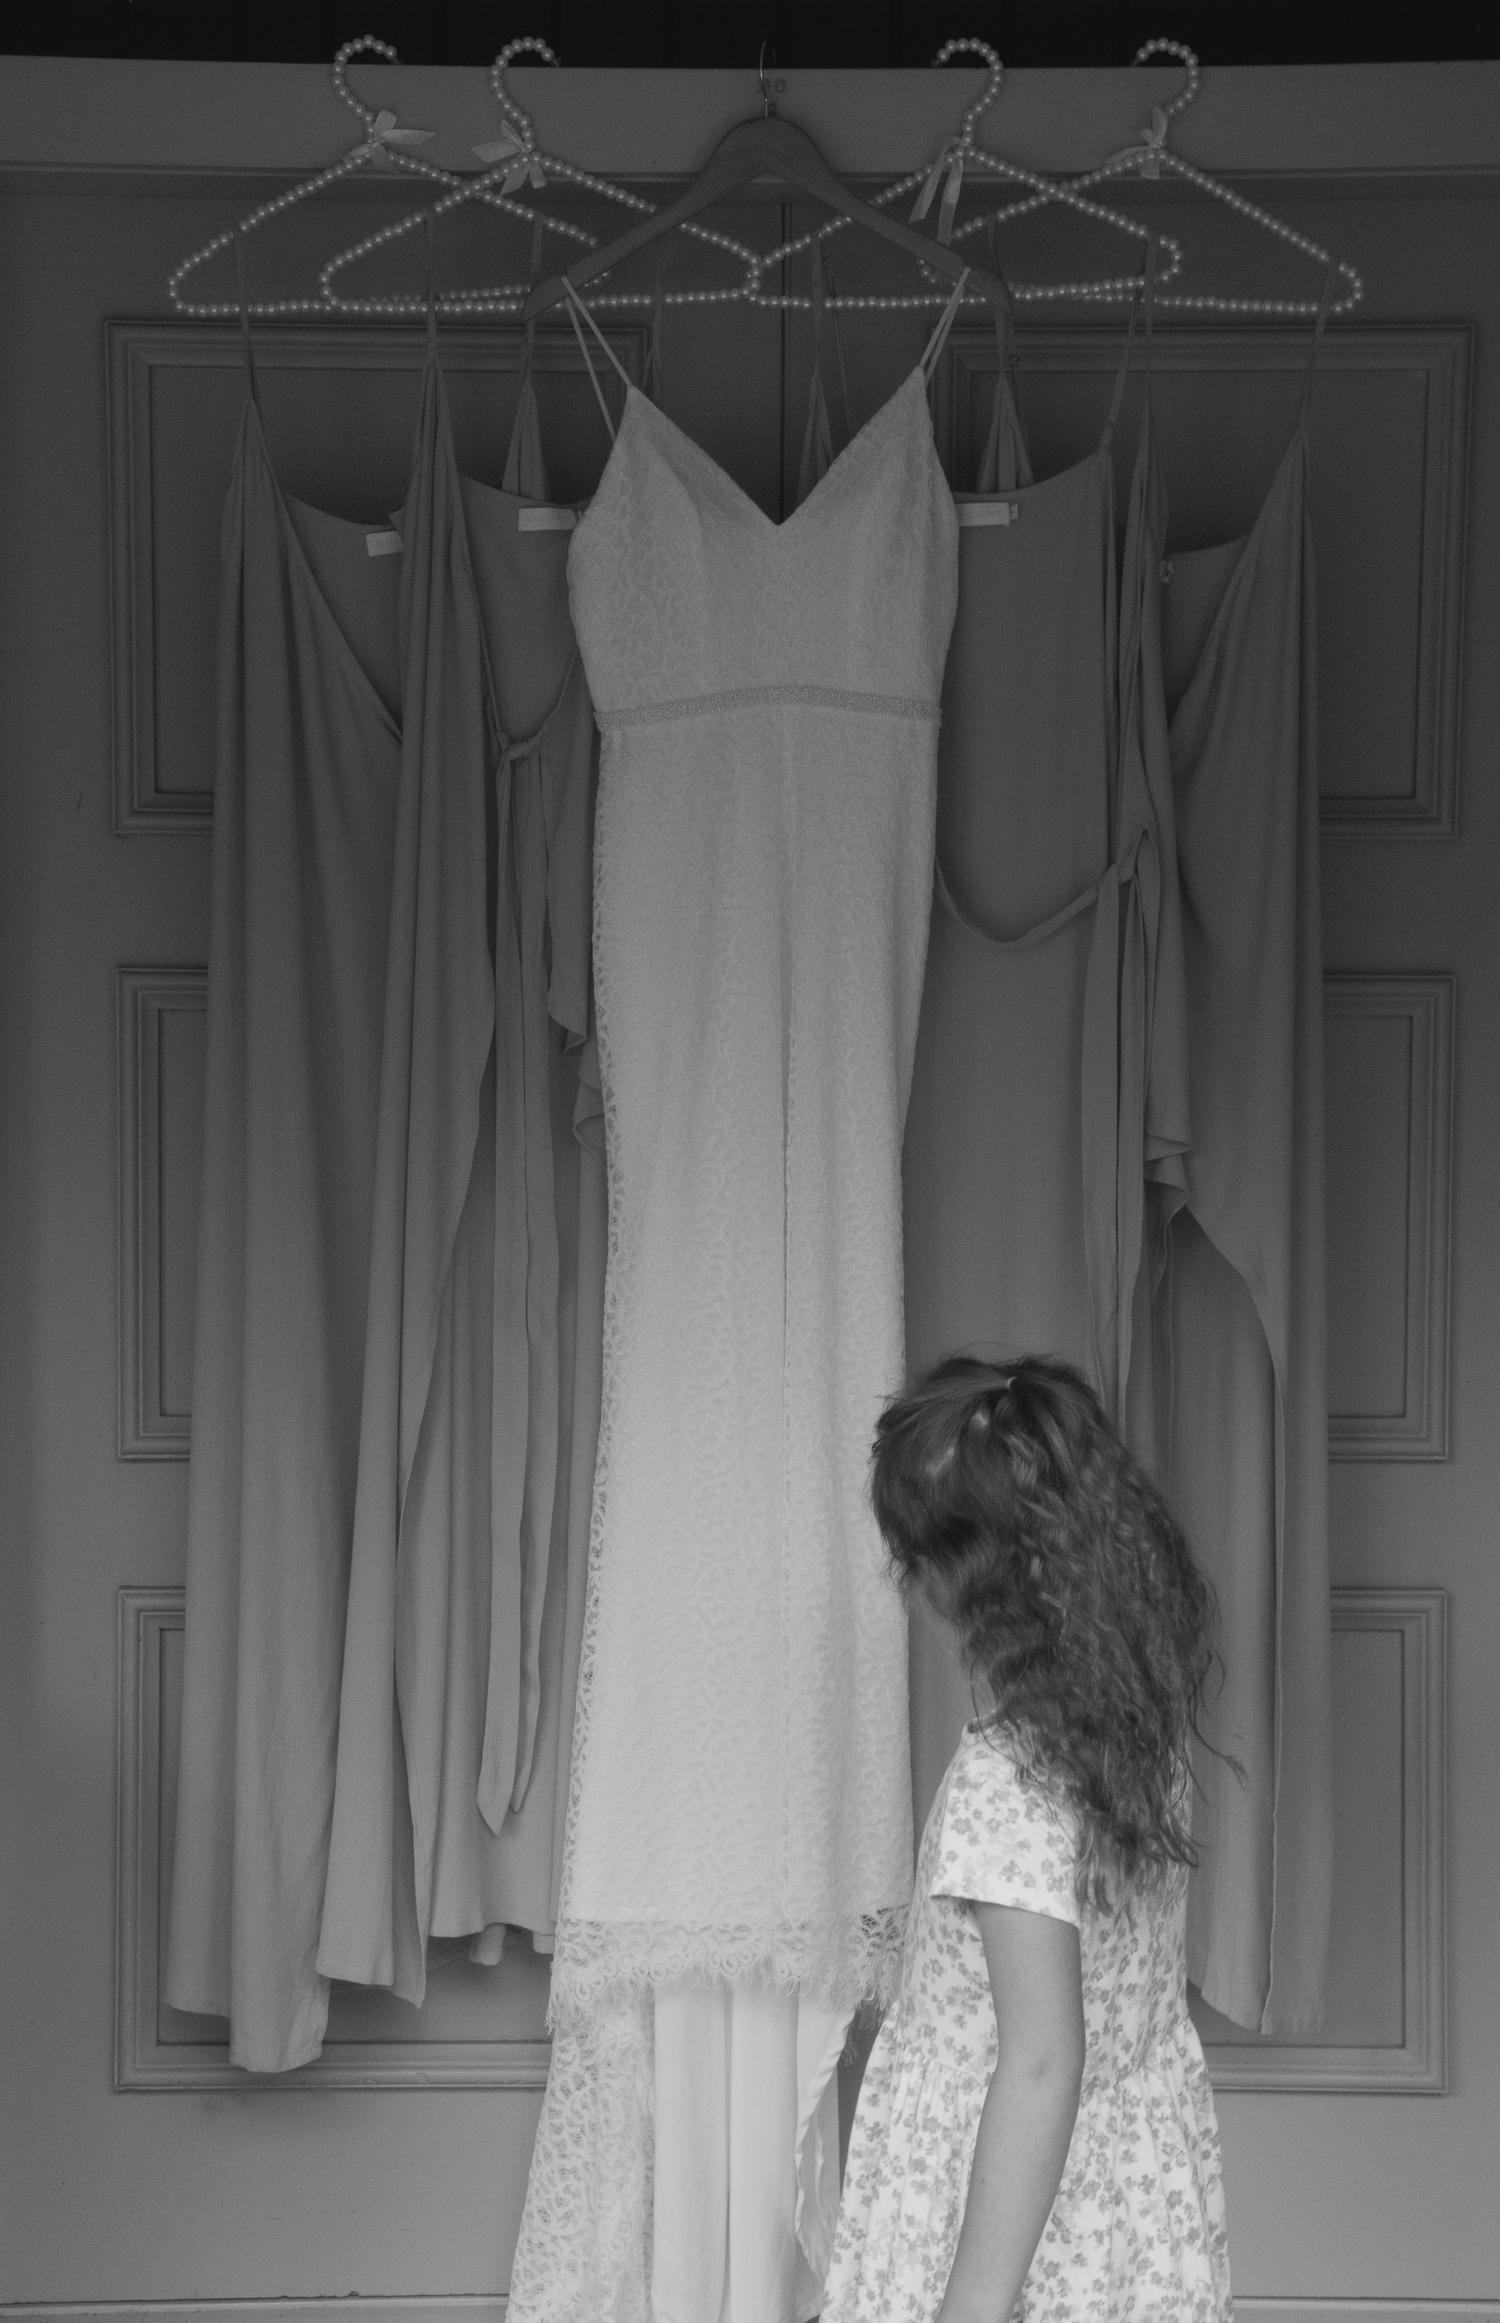 flower girl admiring wedding dress